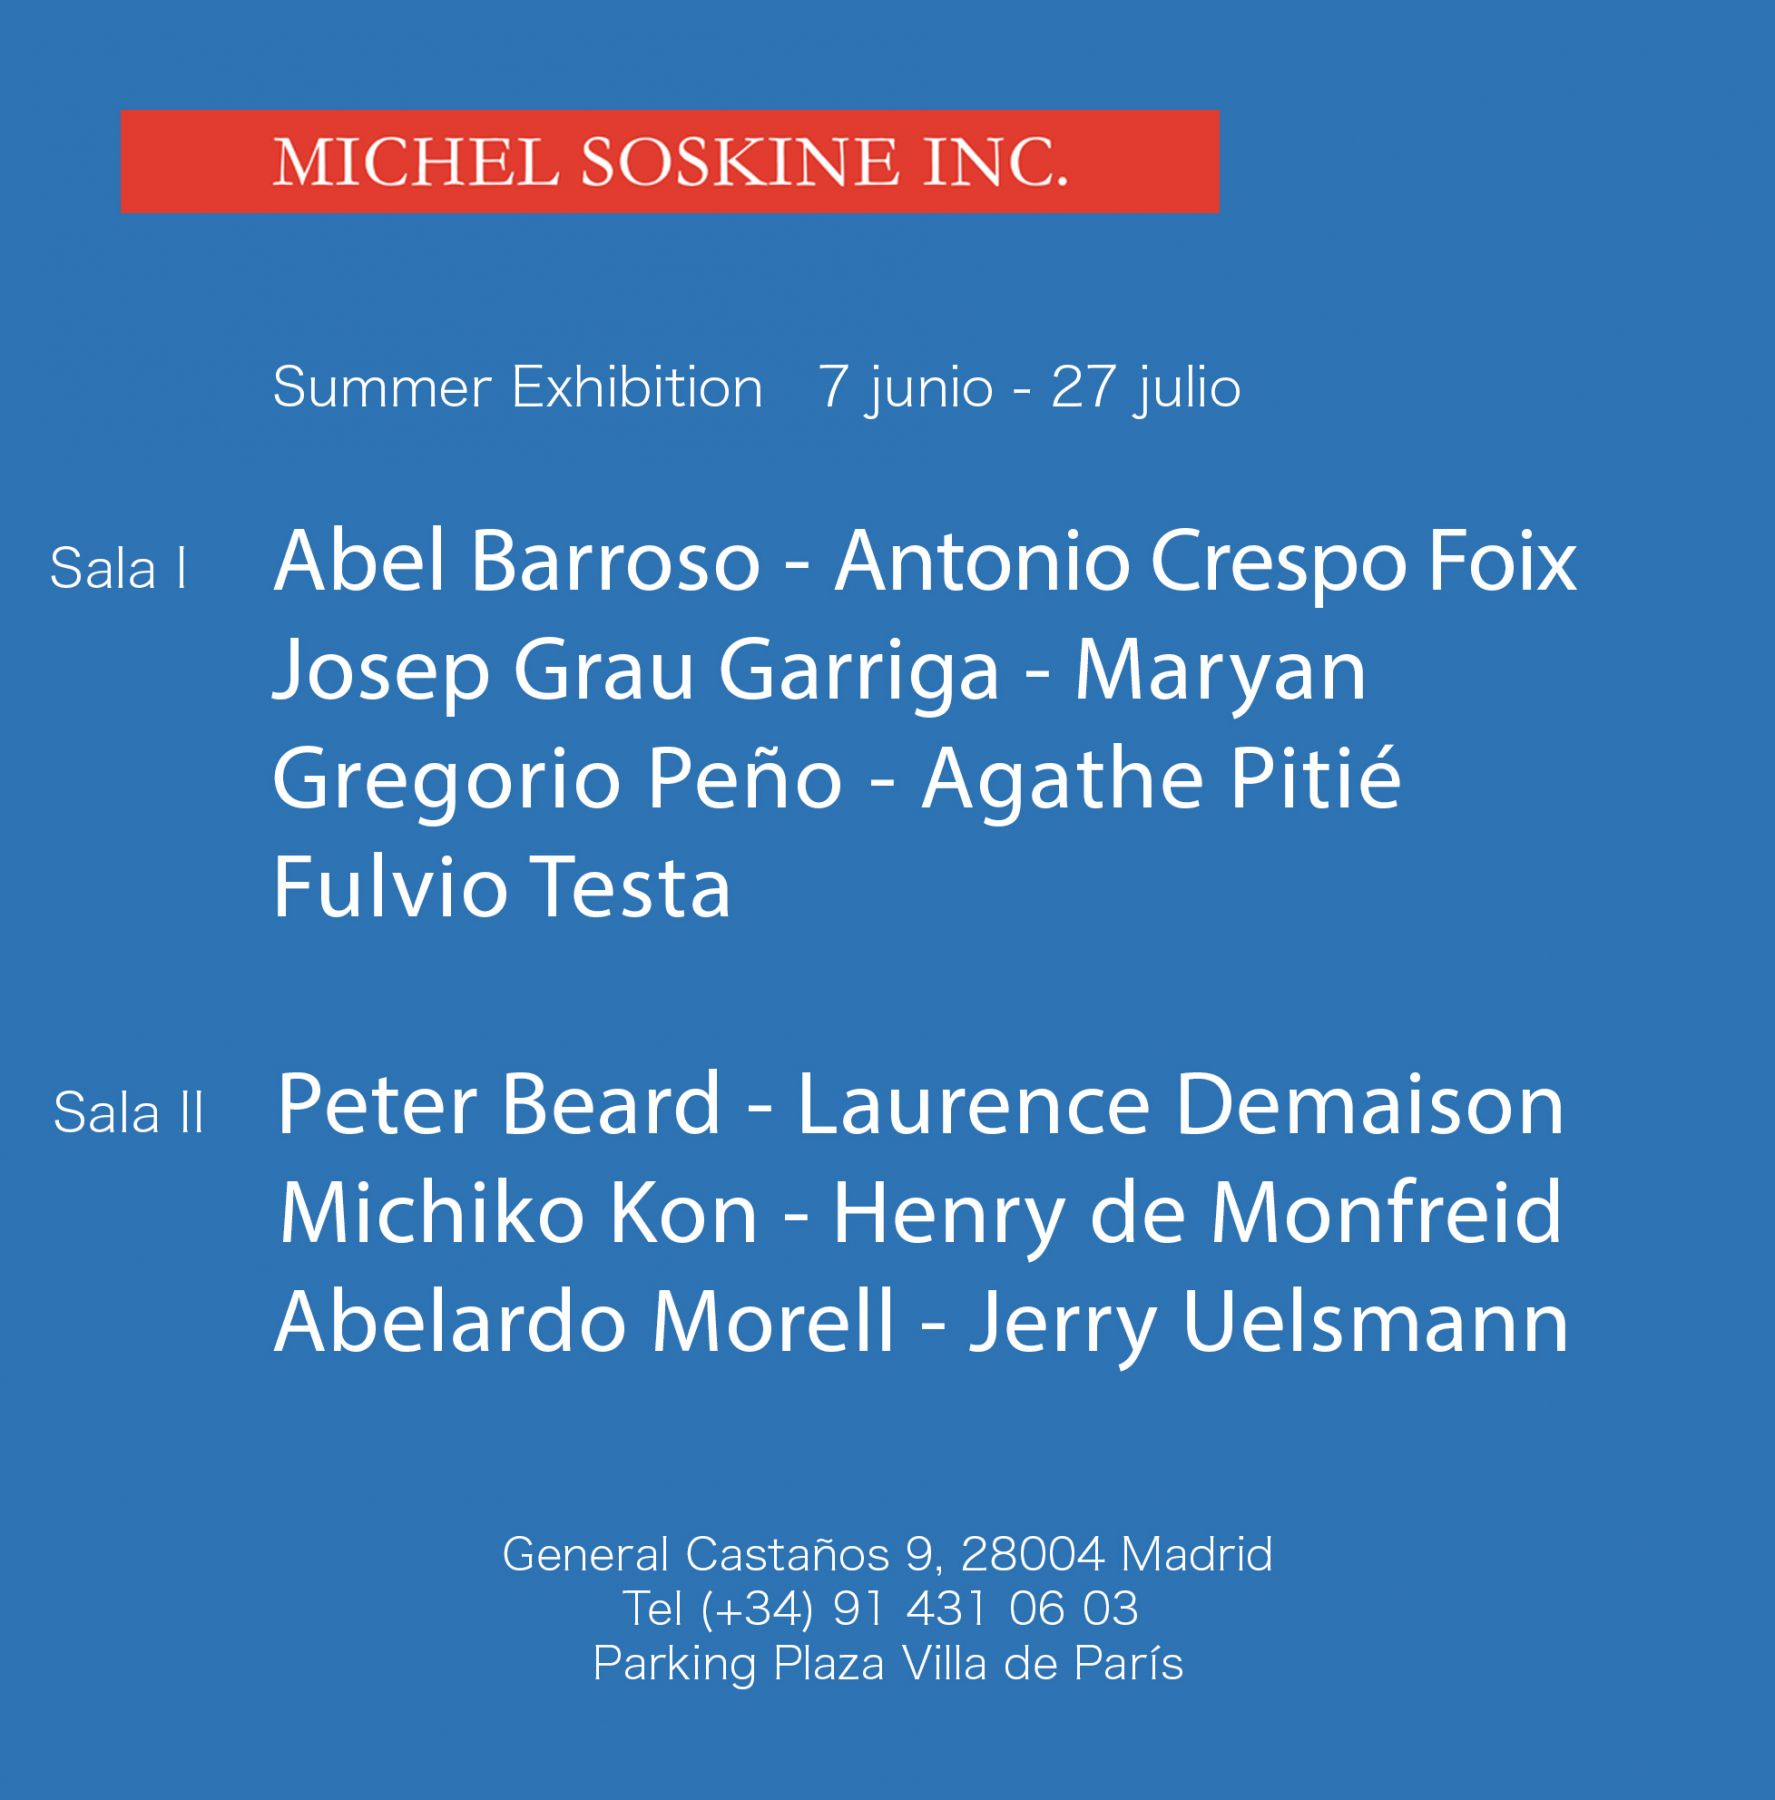 summer show michel soskine